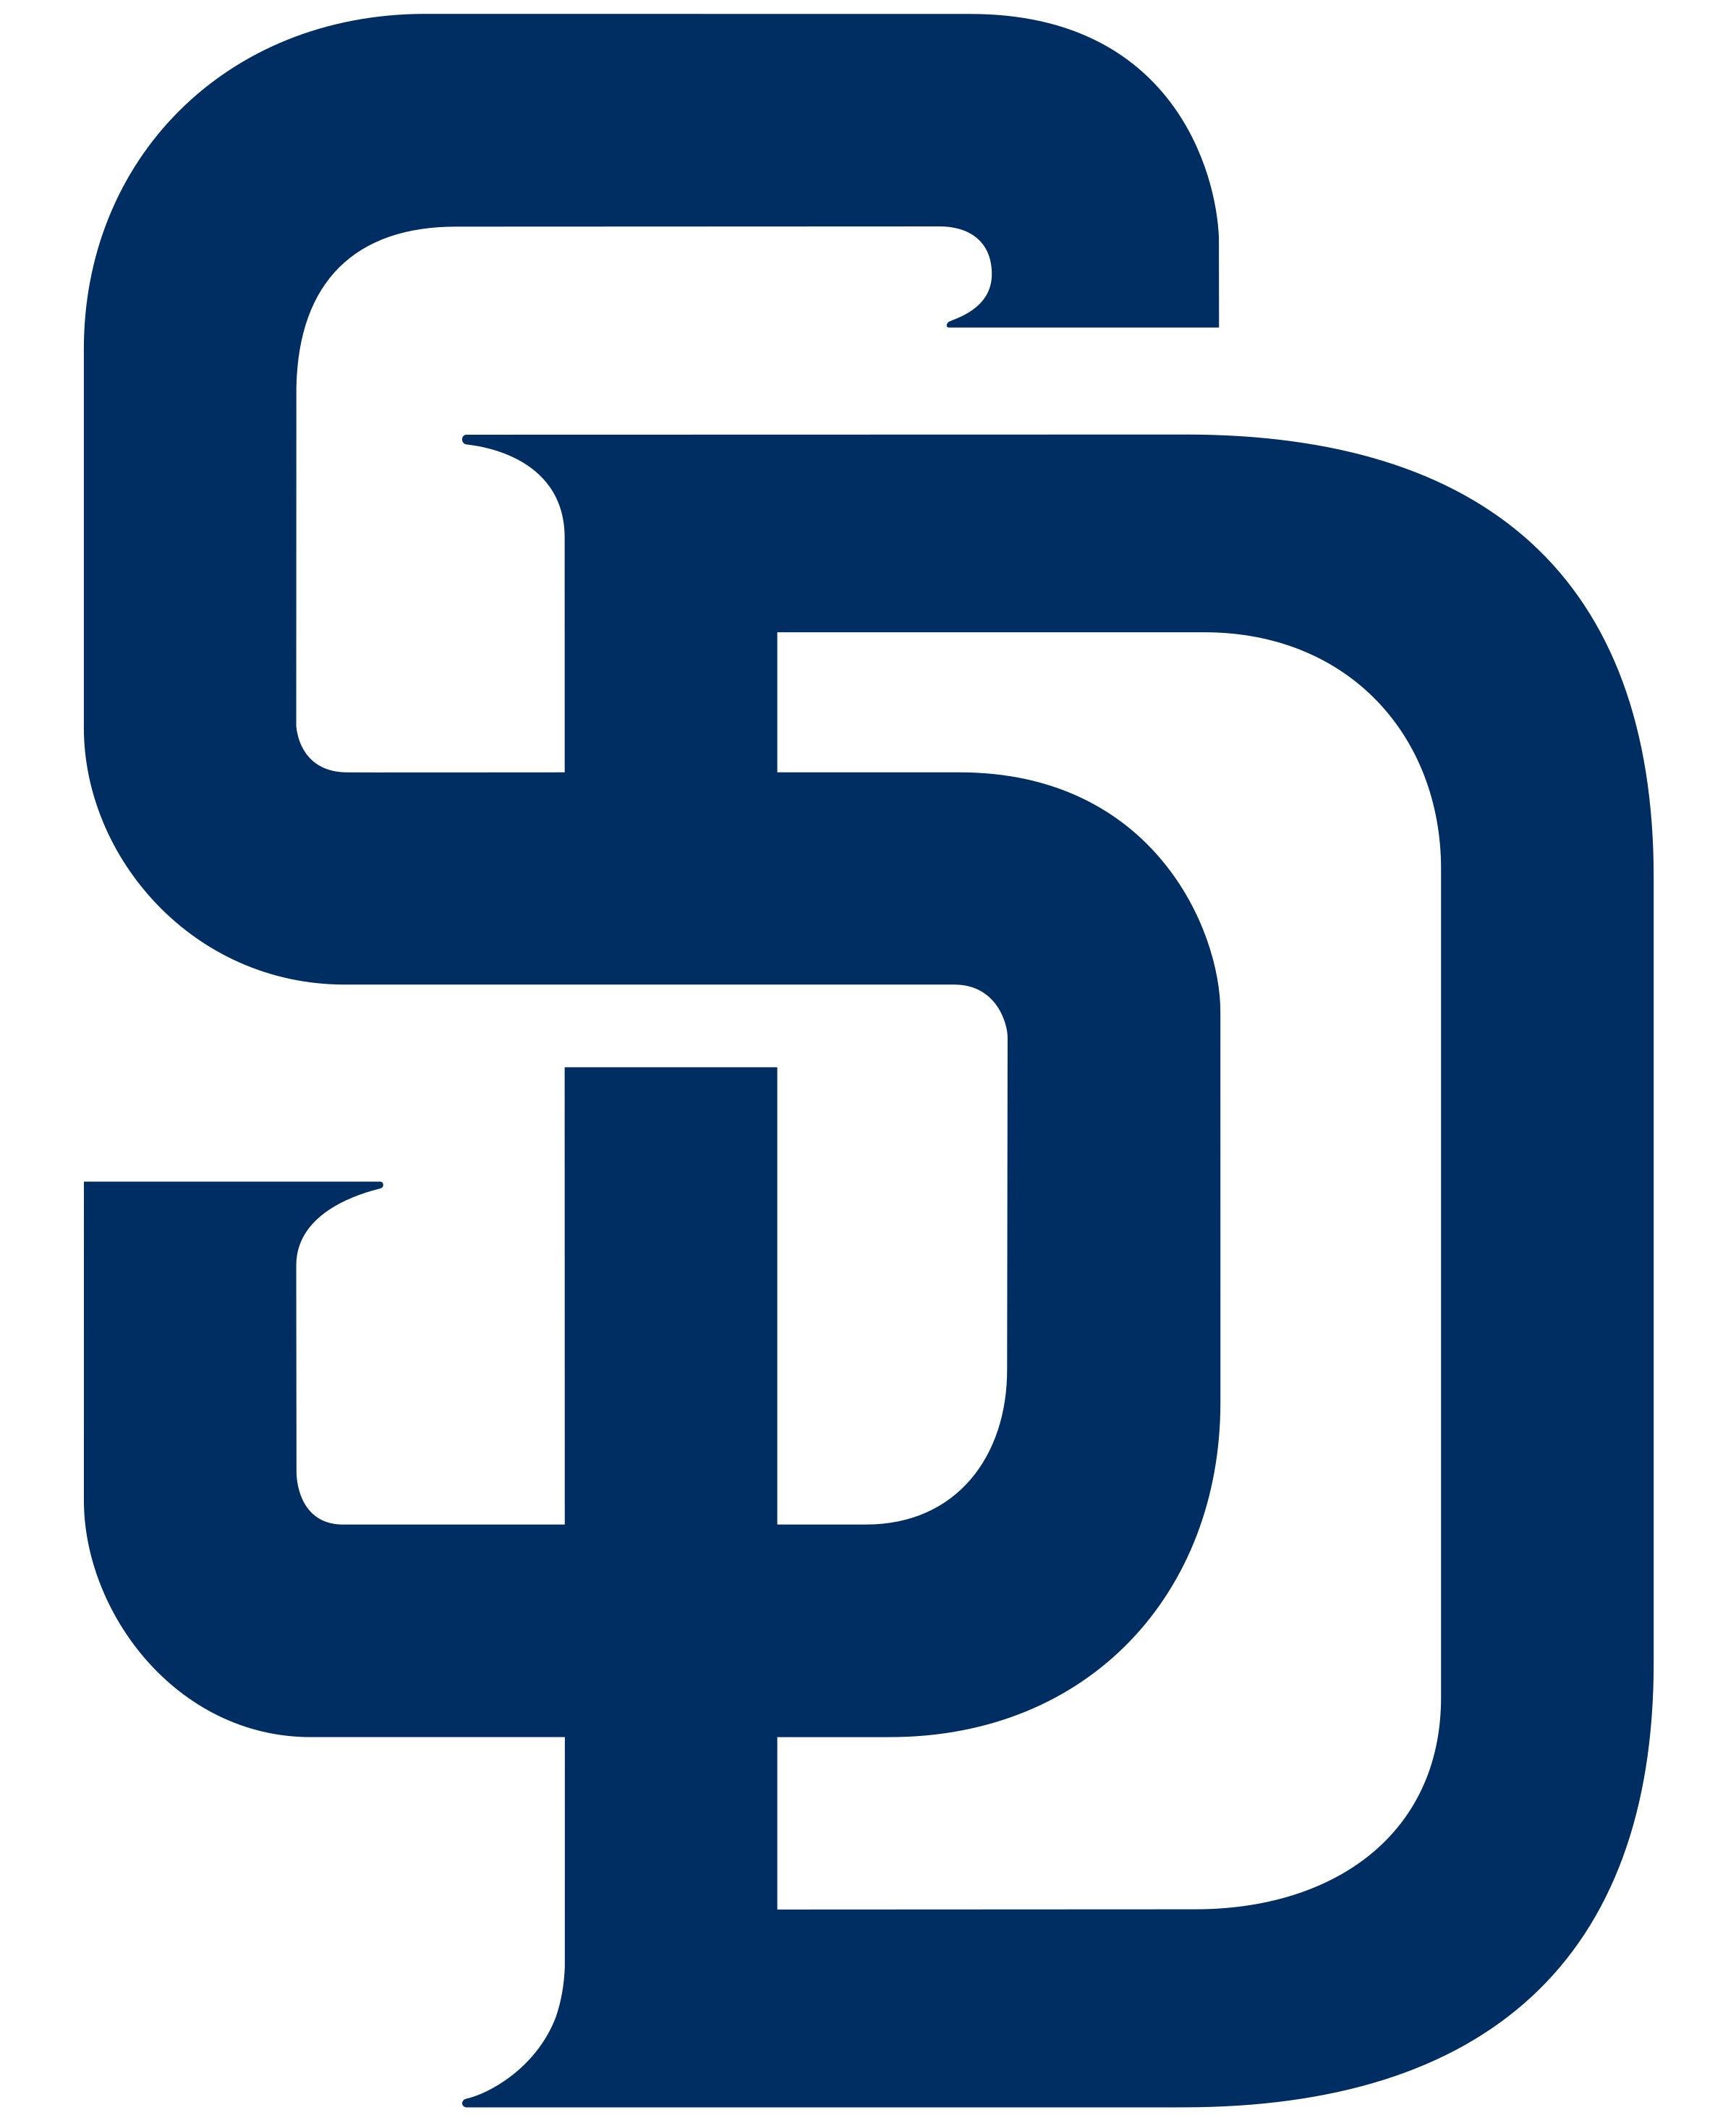 San Diego Padres Logo PNG Image